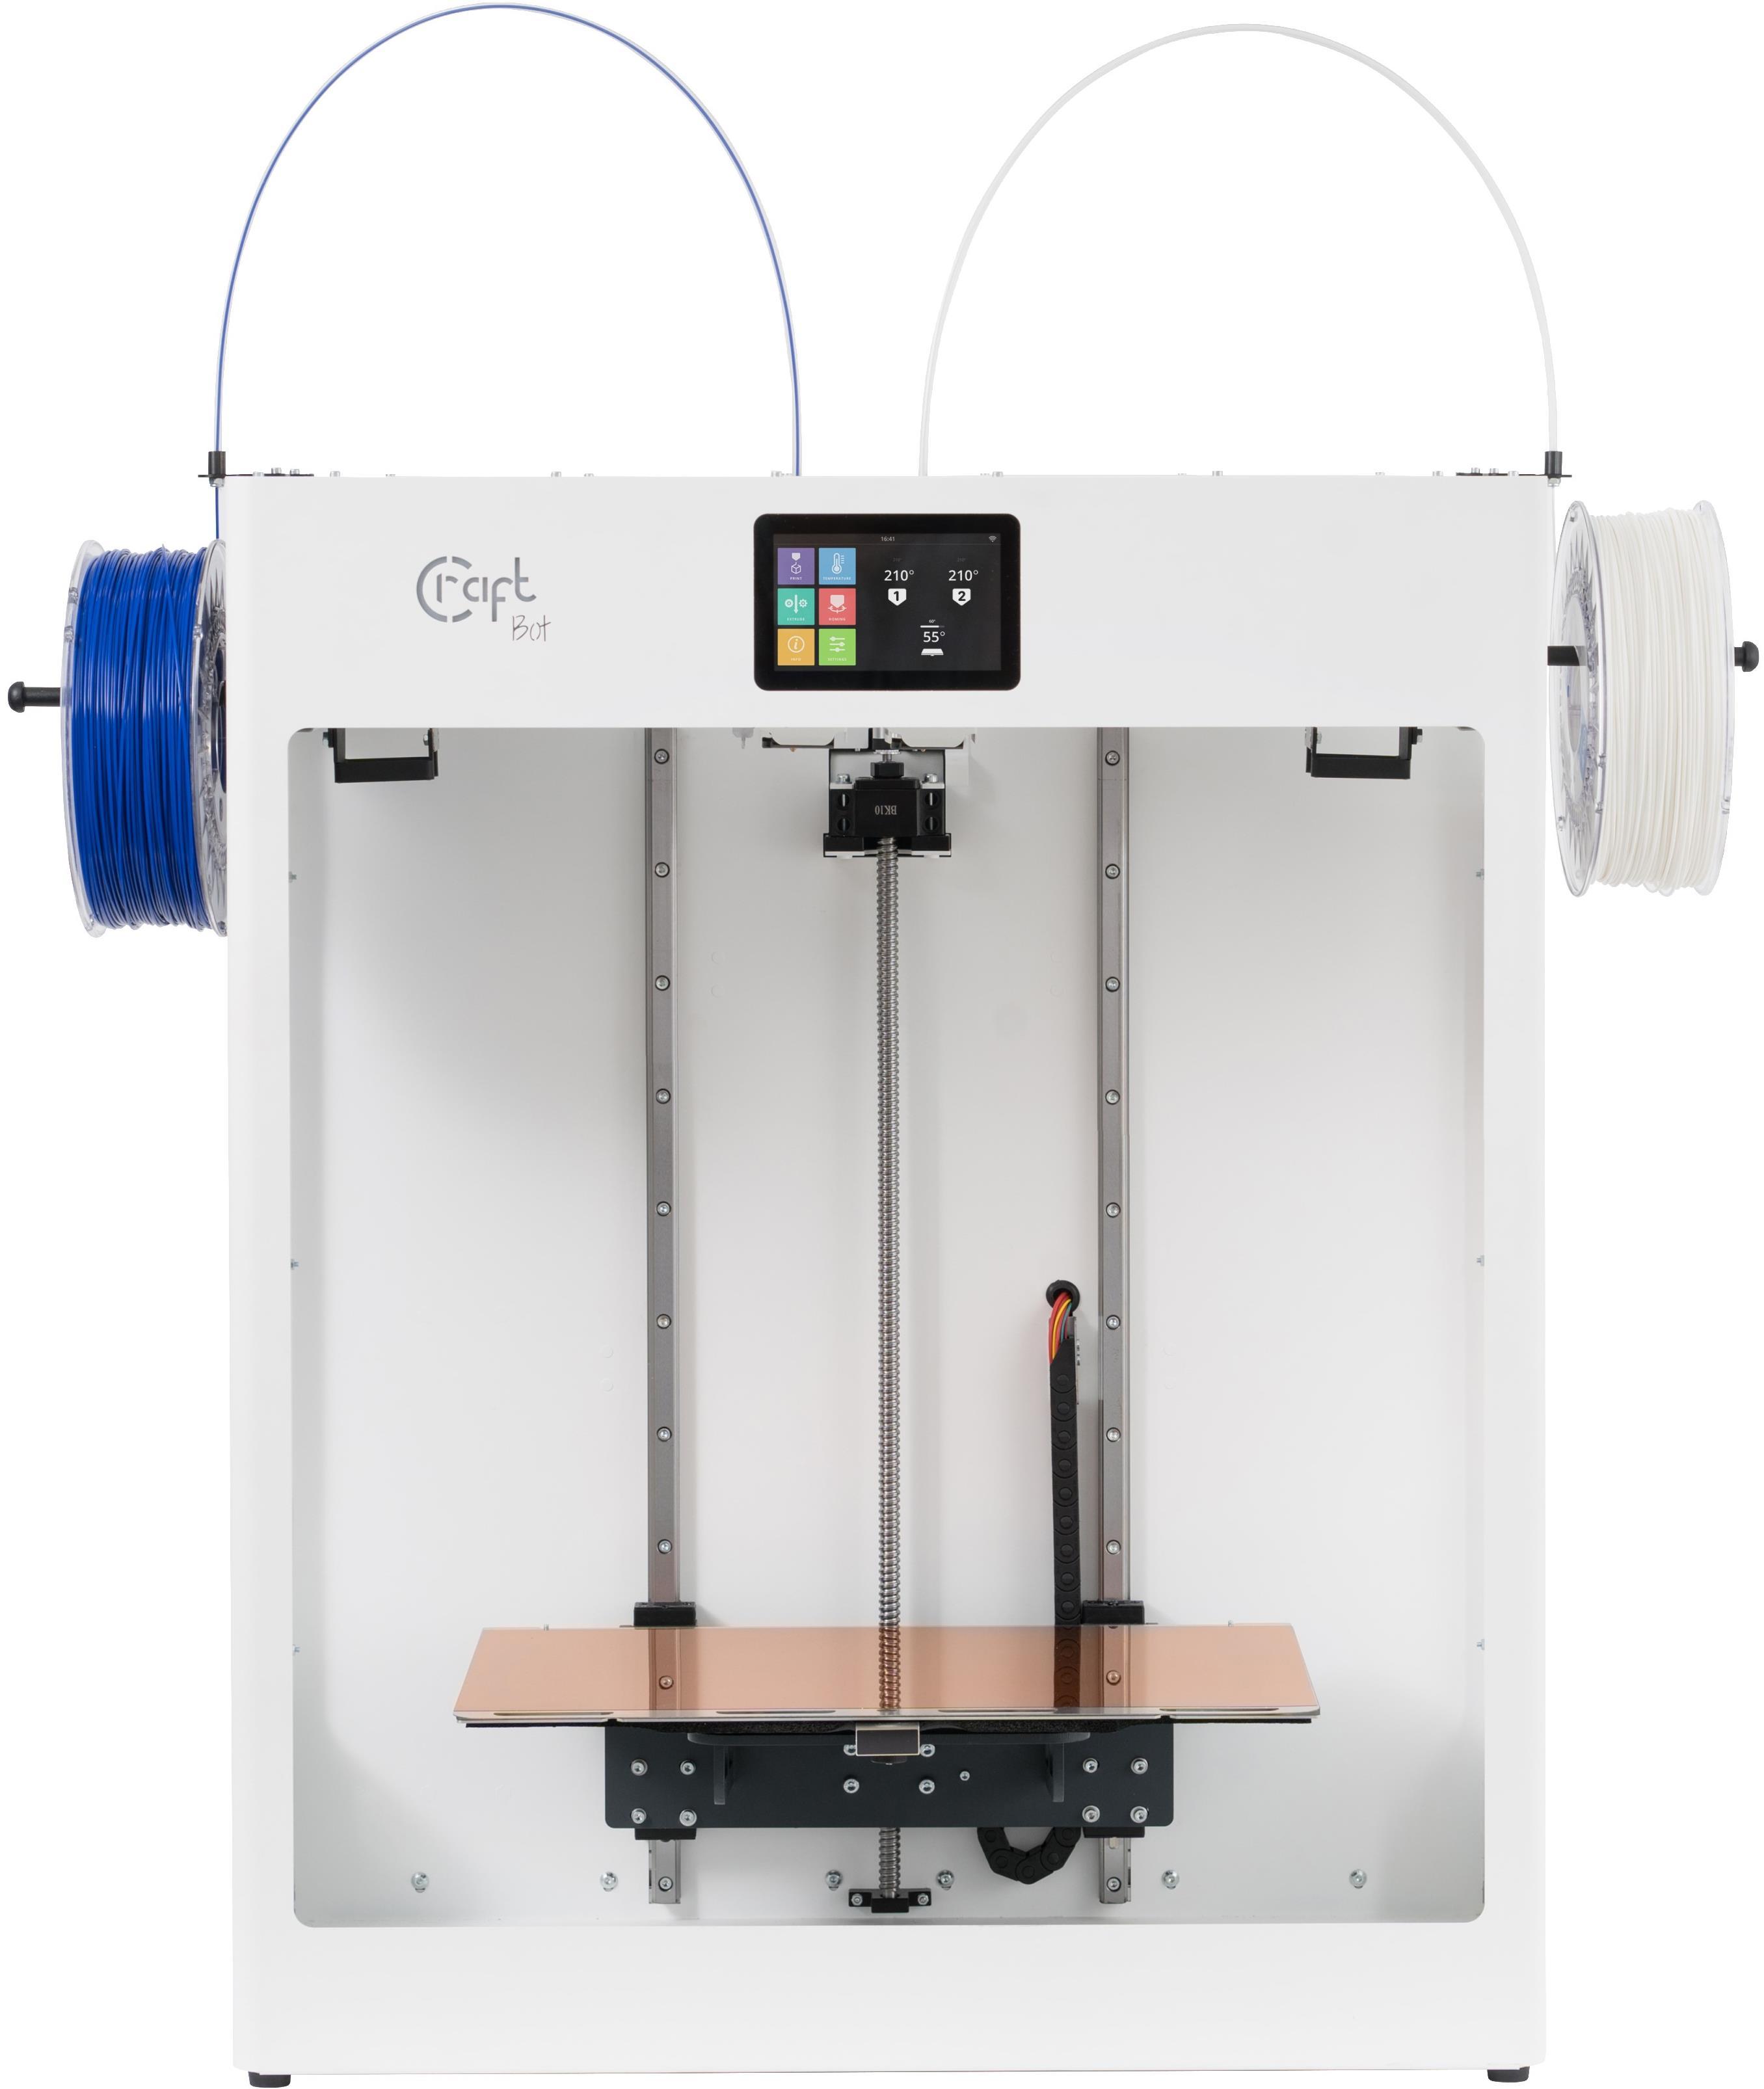 CRAFTBOT FLOW IDEX XL 3D PRINTER